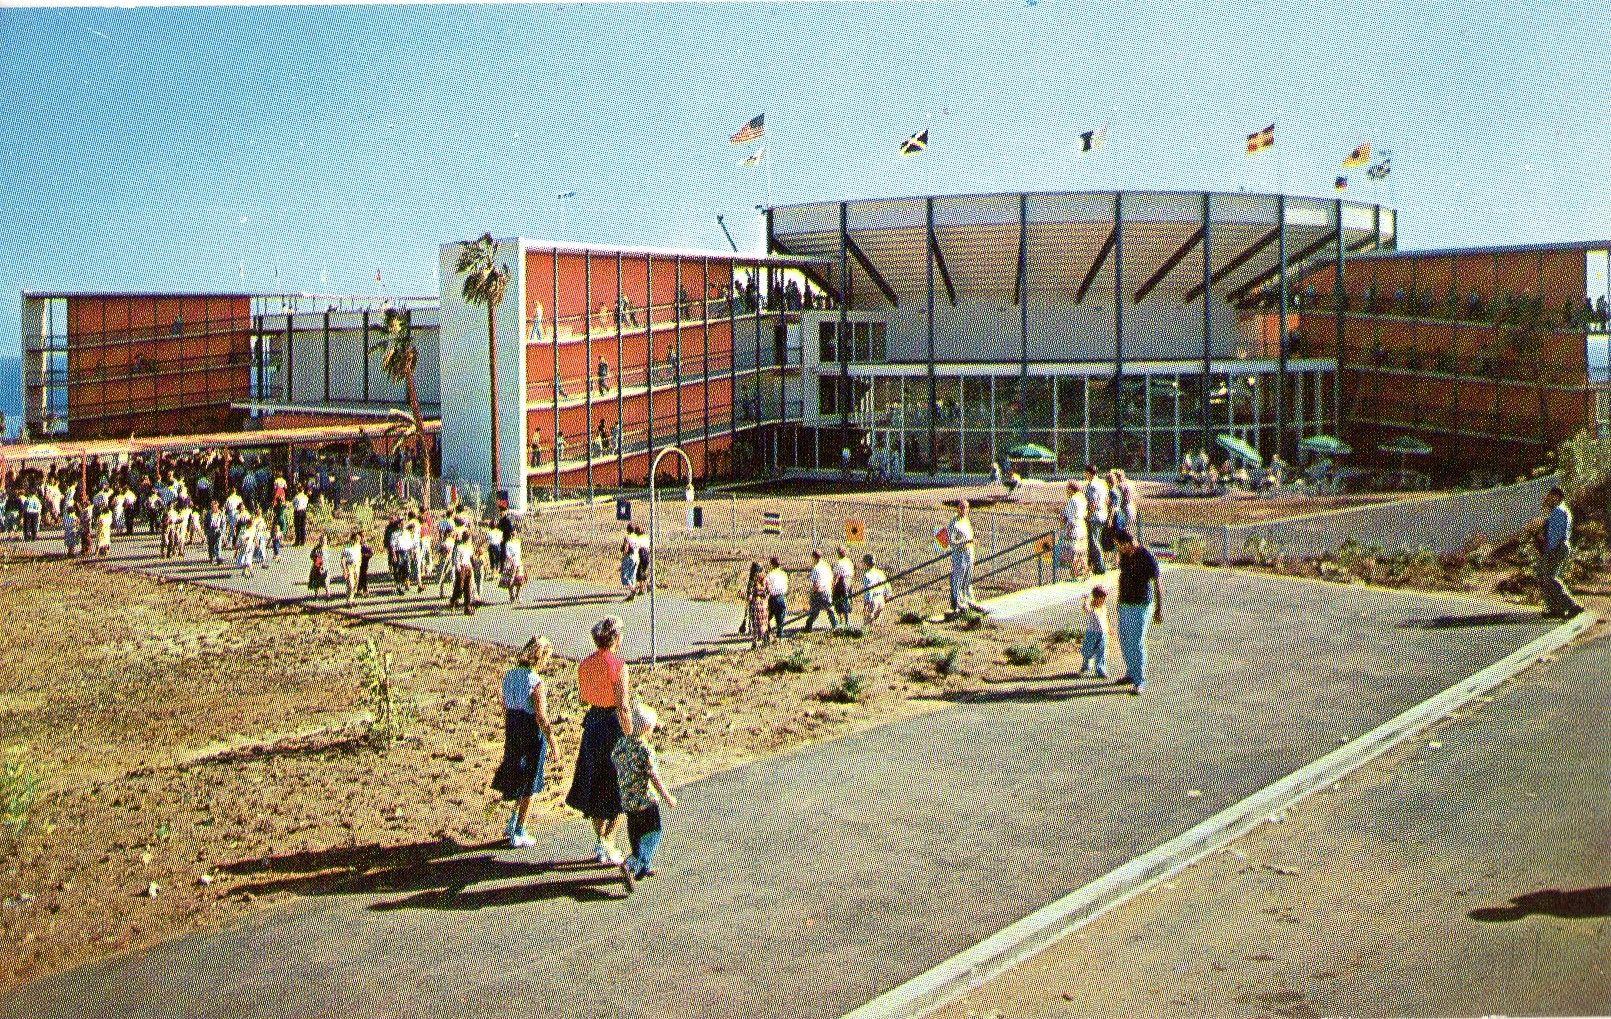 1950 S Marineland Postcard Hagins Collection California Postcard Postcard Old Postcards